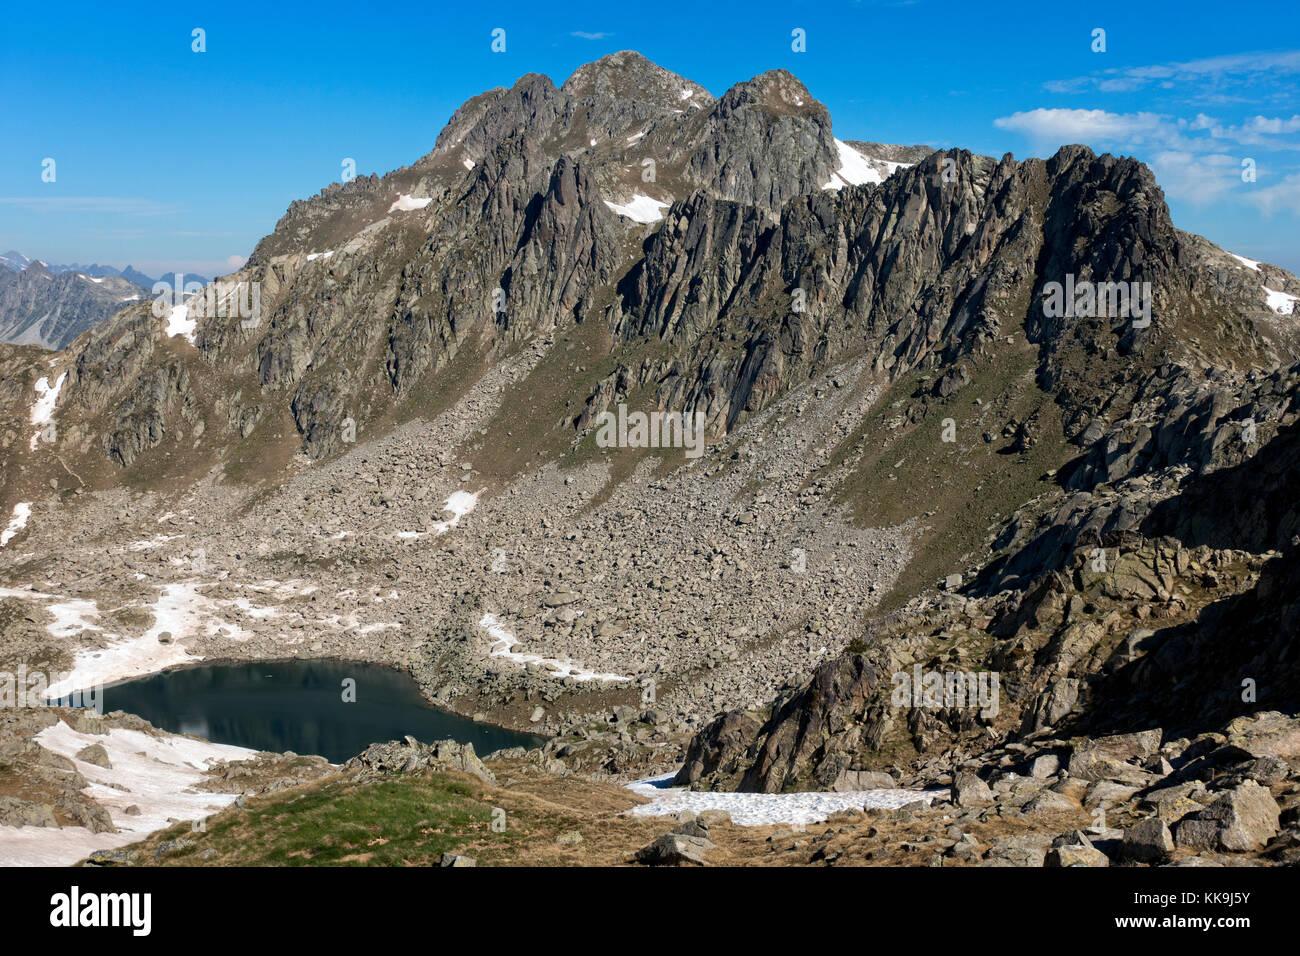 Montardo peak (2833m).Aiguestortes National Park.Catalonia.Spain - Stock Image